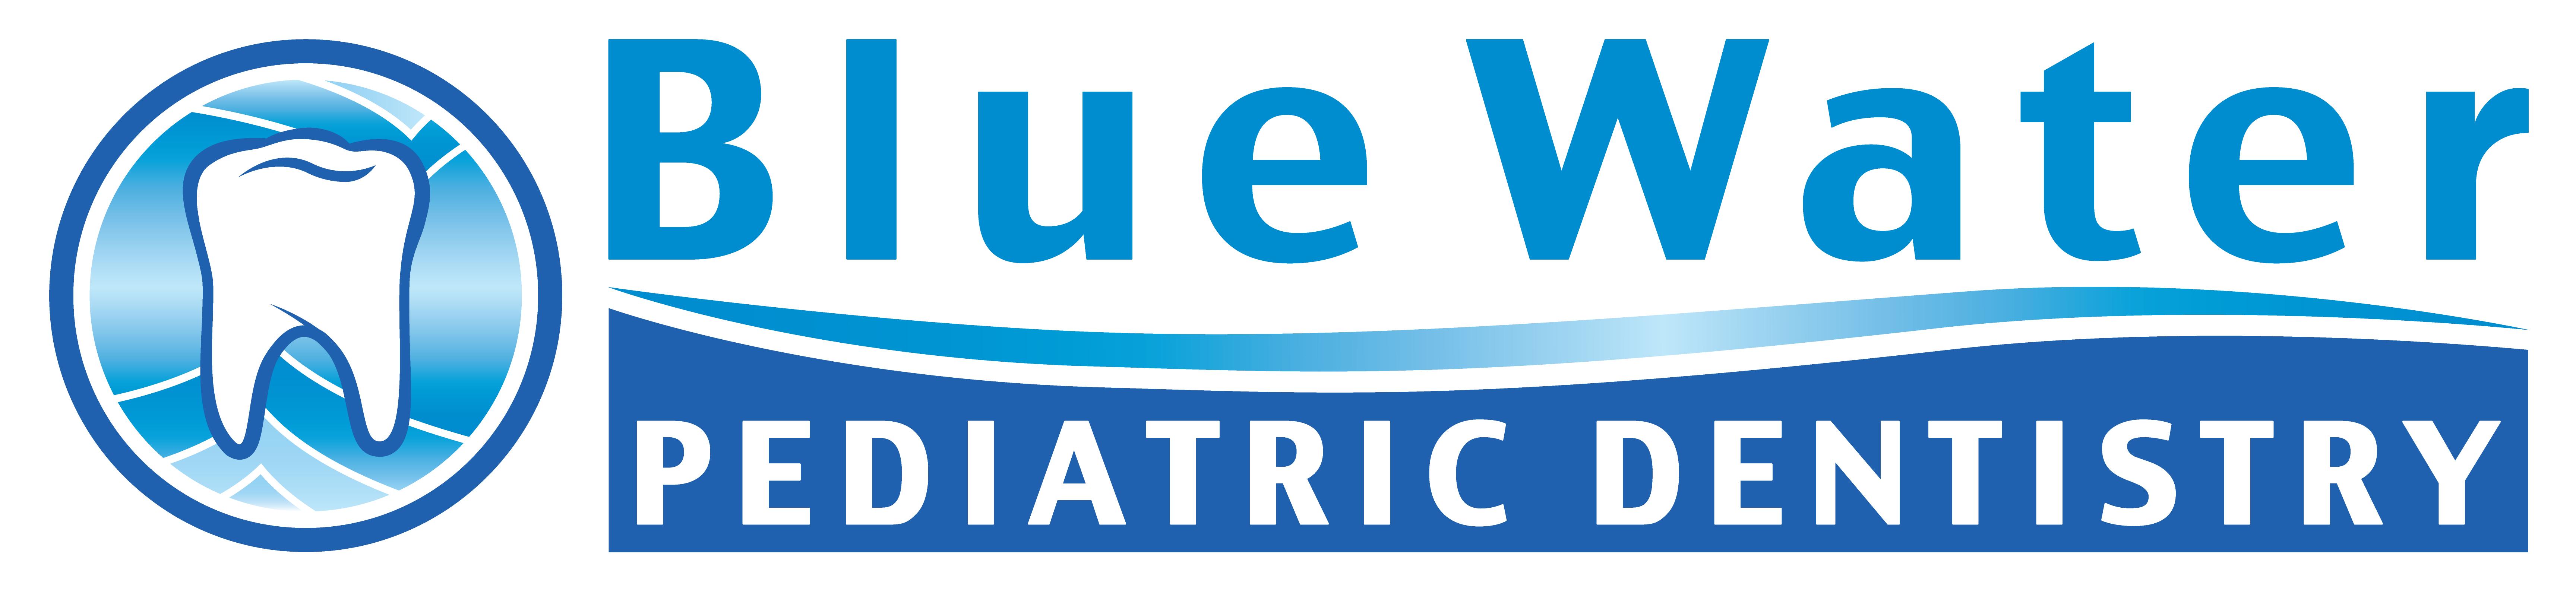 Sponsor Blue Water Pediatric Dentistry